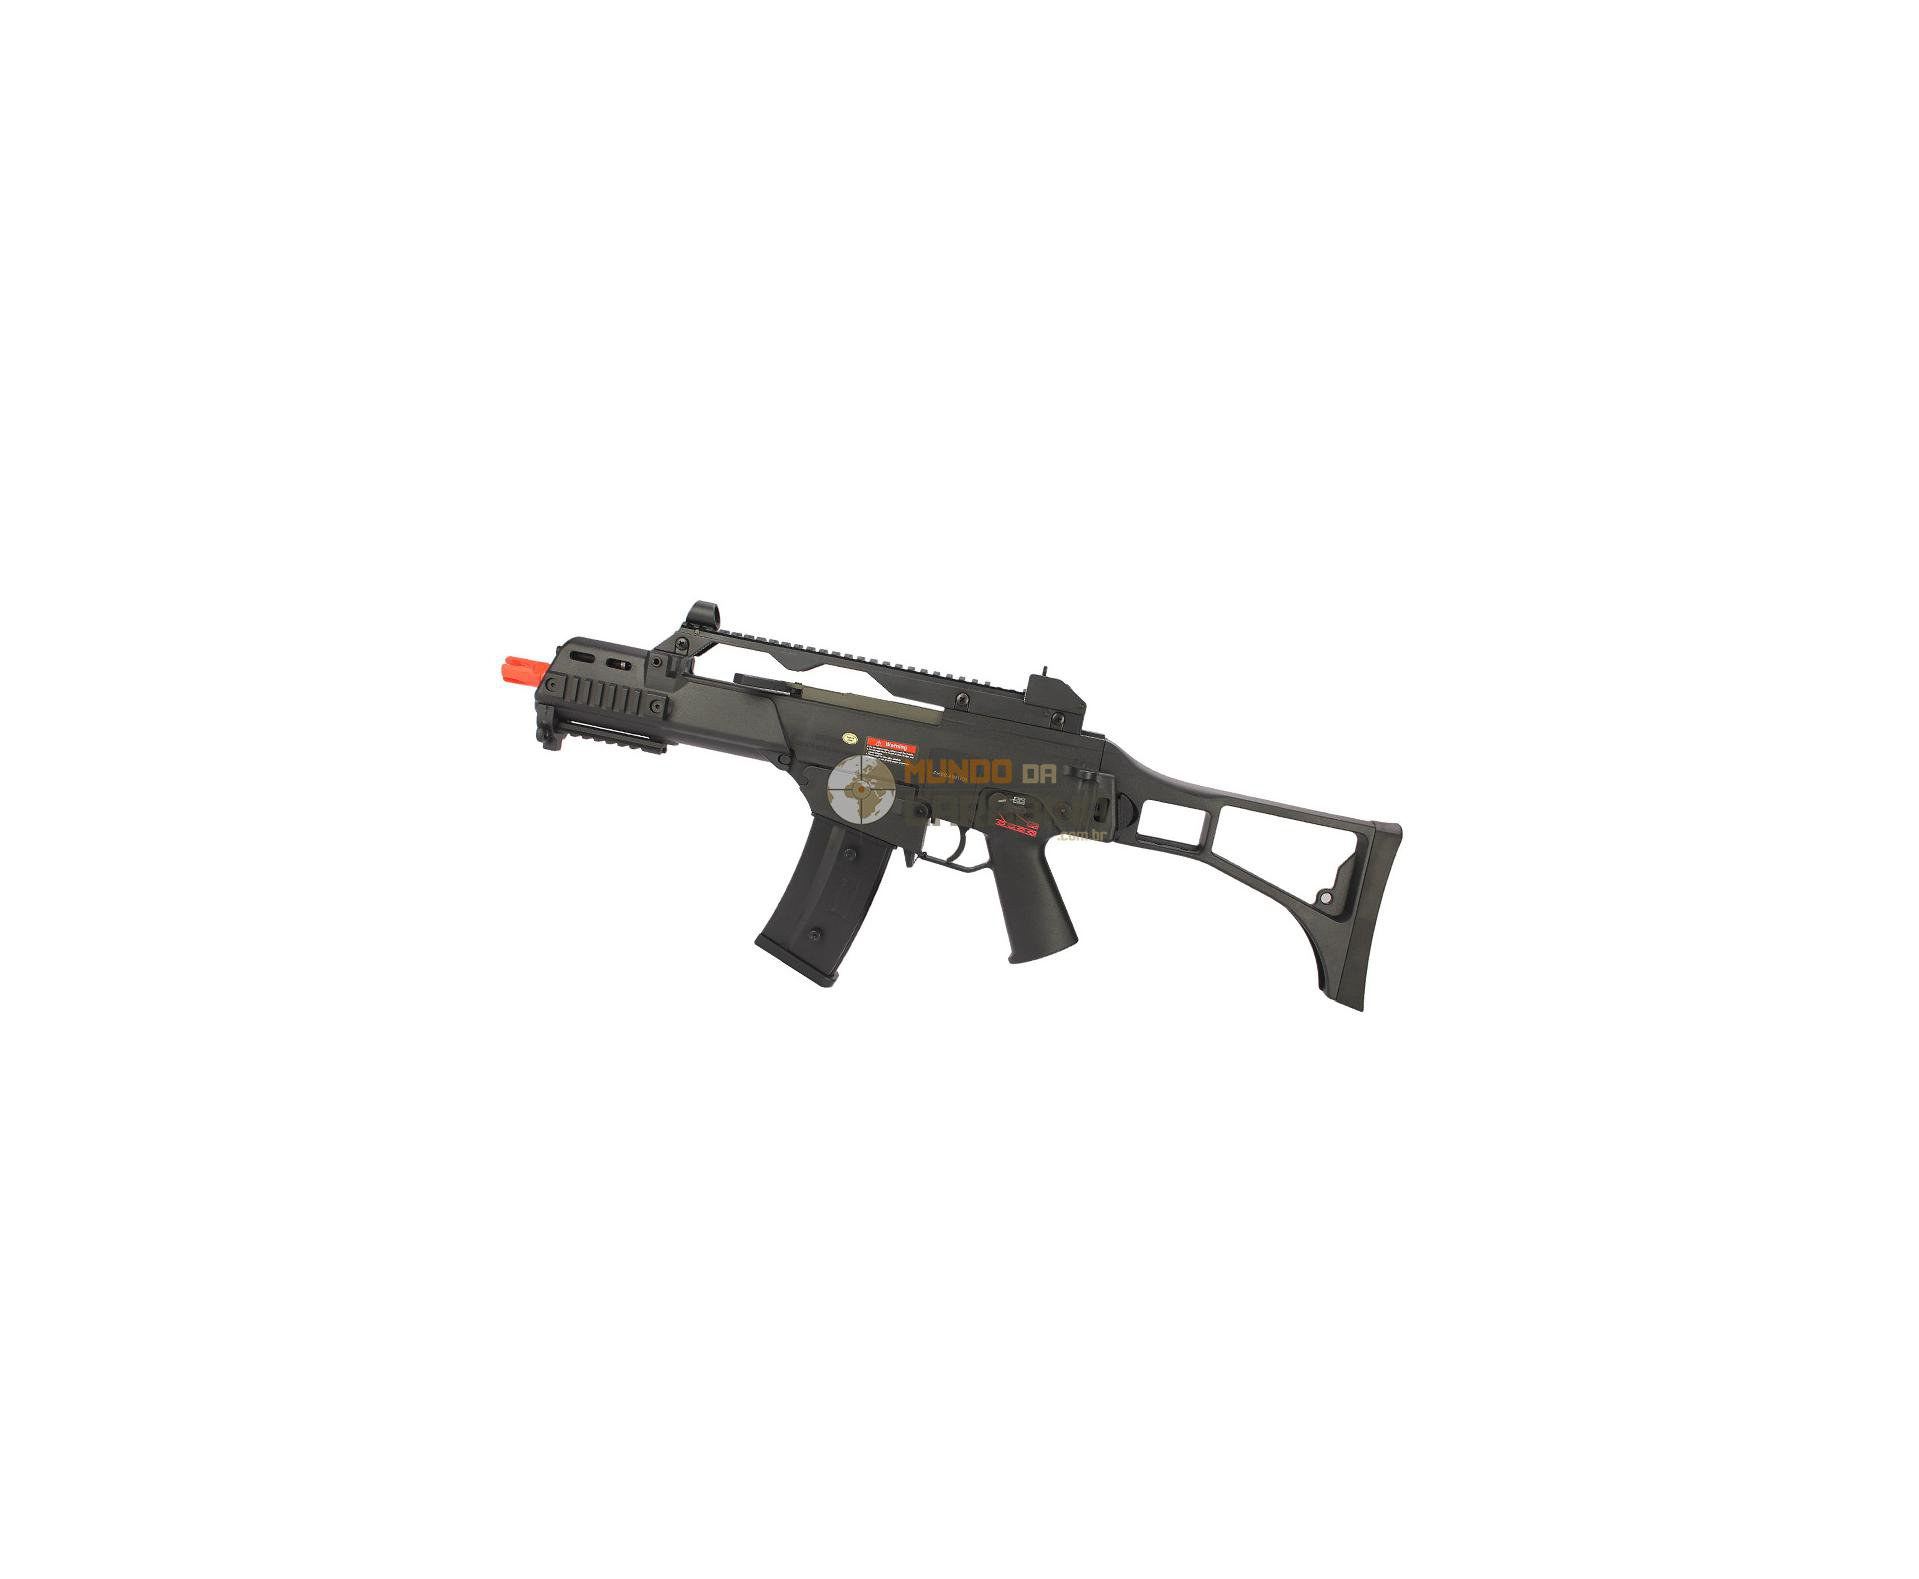 Rifle De Airsoft G36 Full Metal Blowback - Cal 6.0mm - Ares